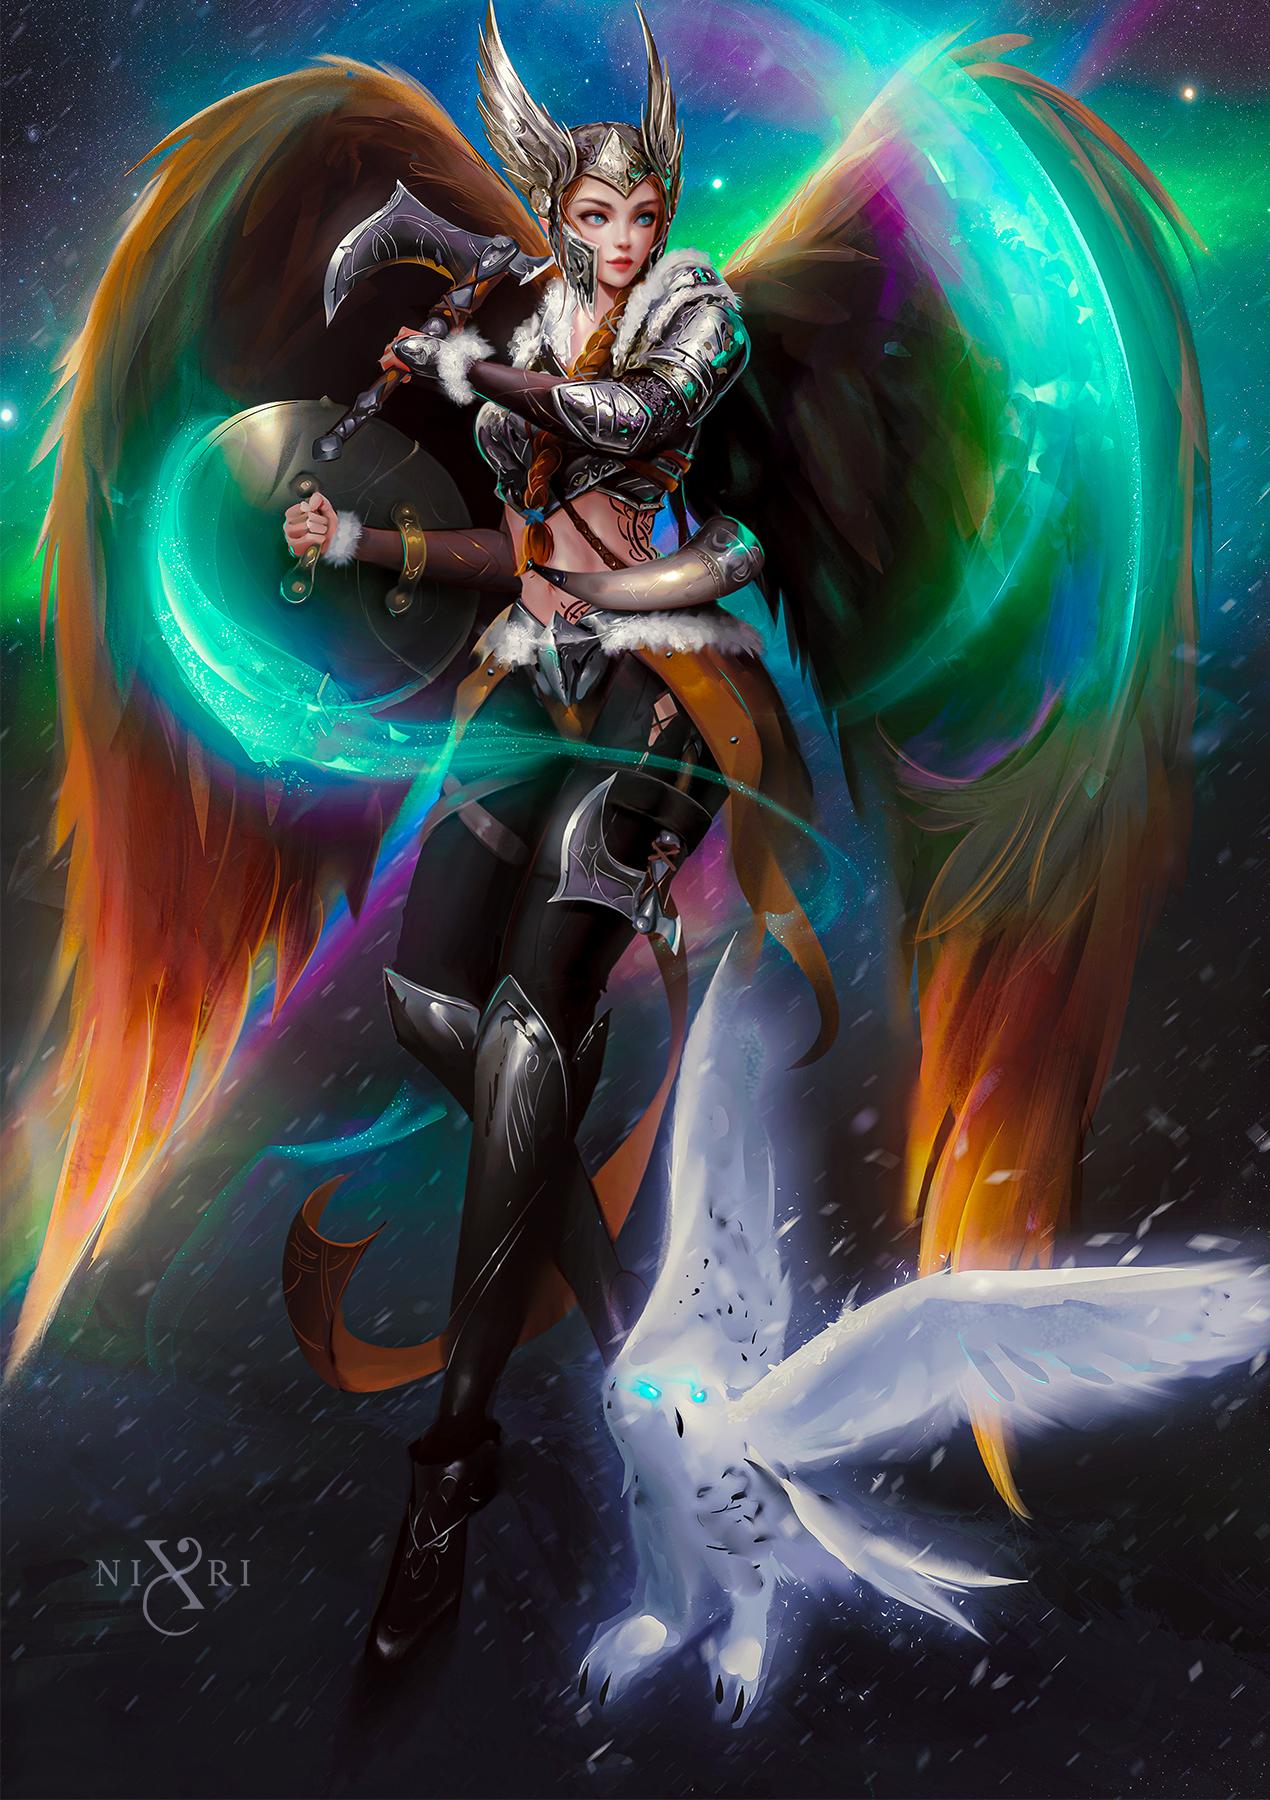 Nixri Drawing Women Helmet Warrior Valkyries Wings Axes Shield Weapon Owl Birds Fantasy Art Flying C 1270x1800